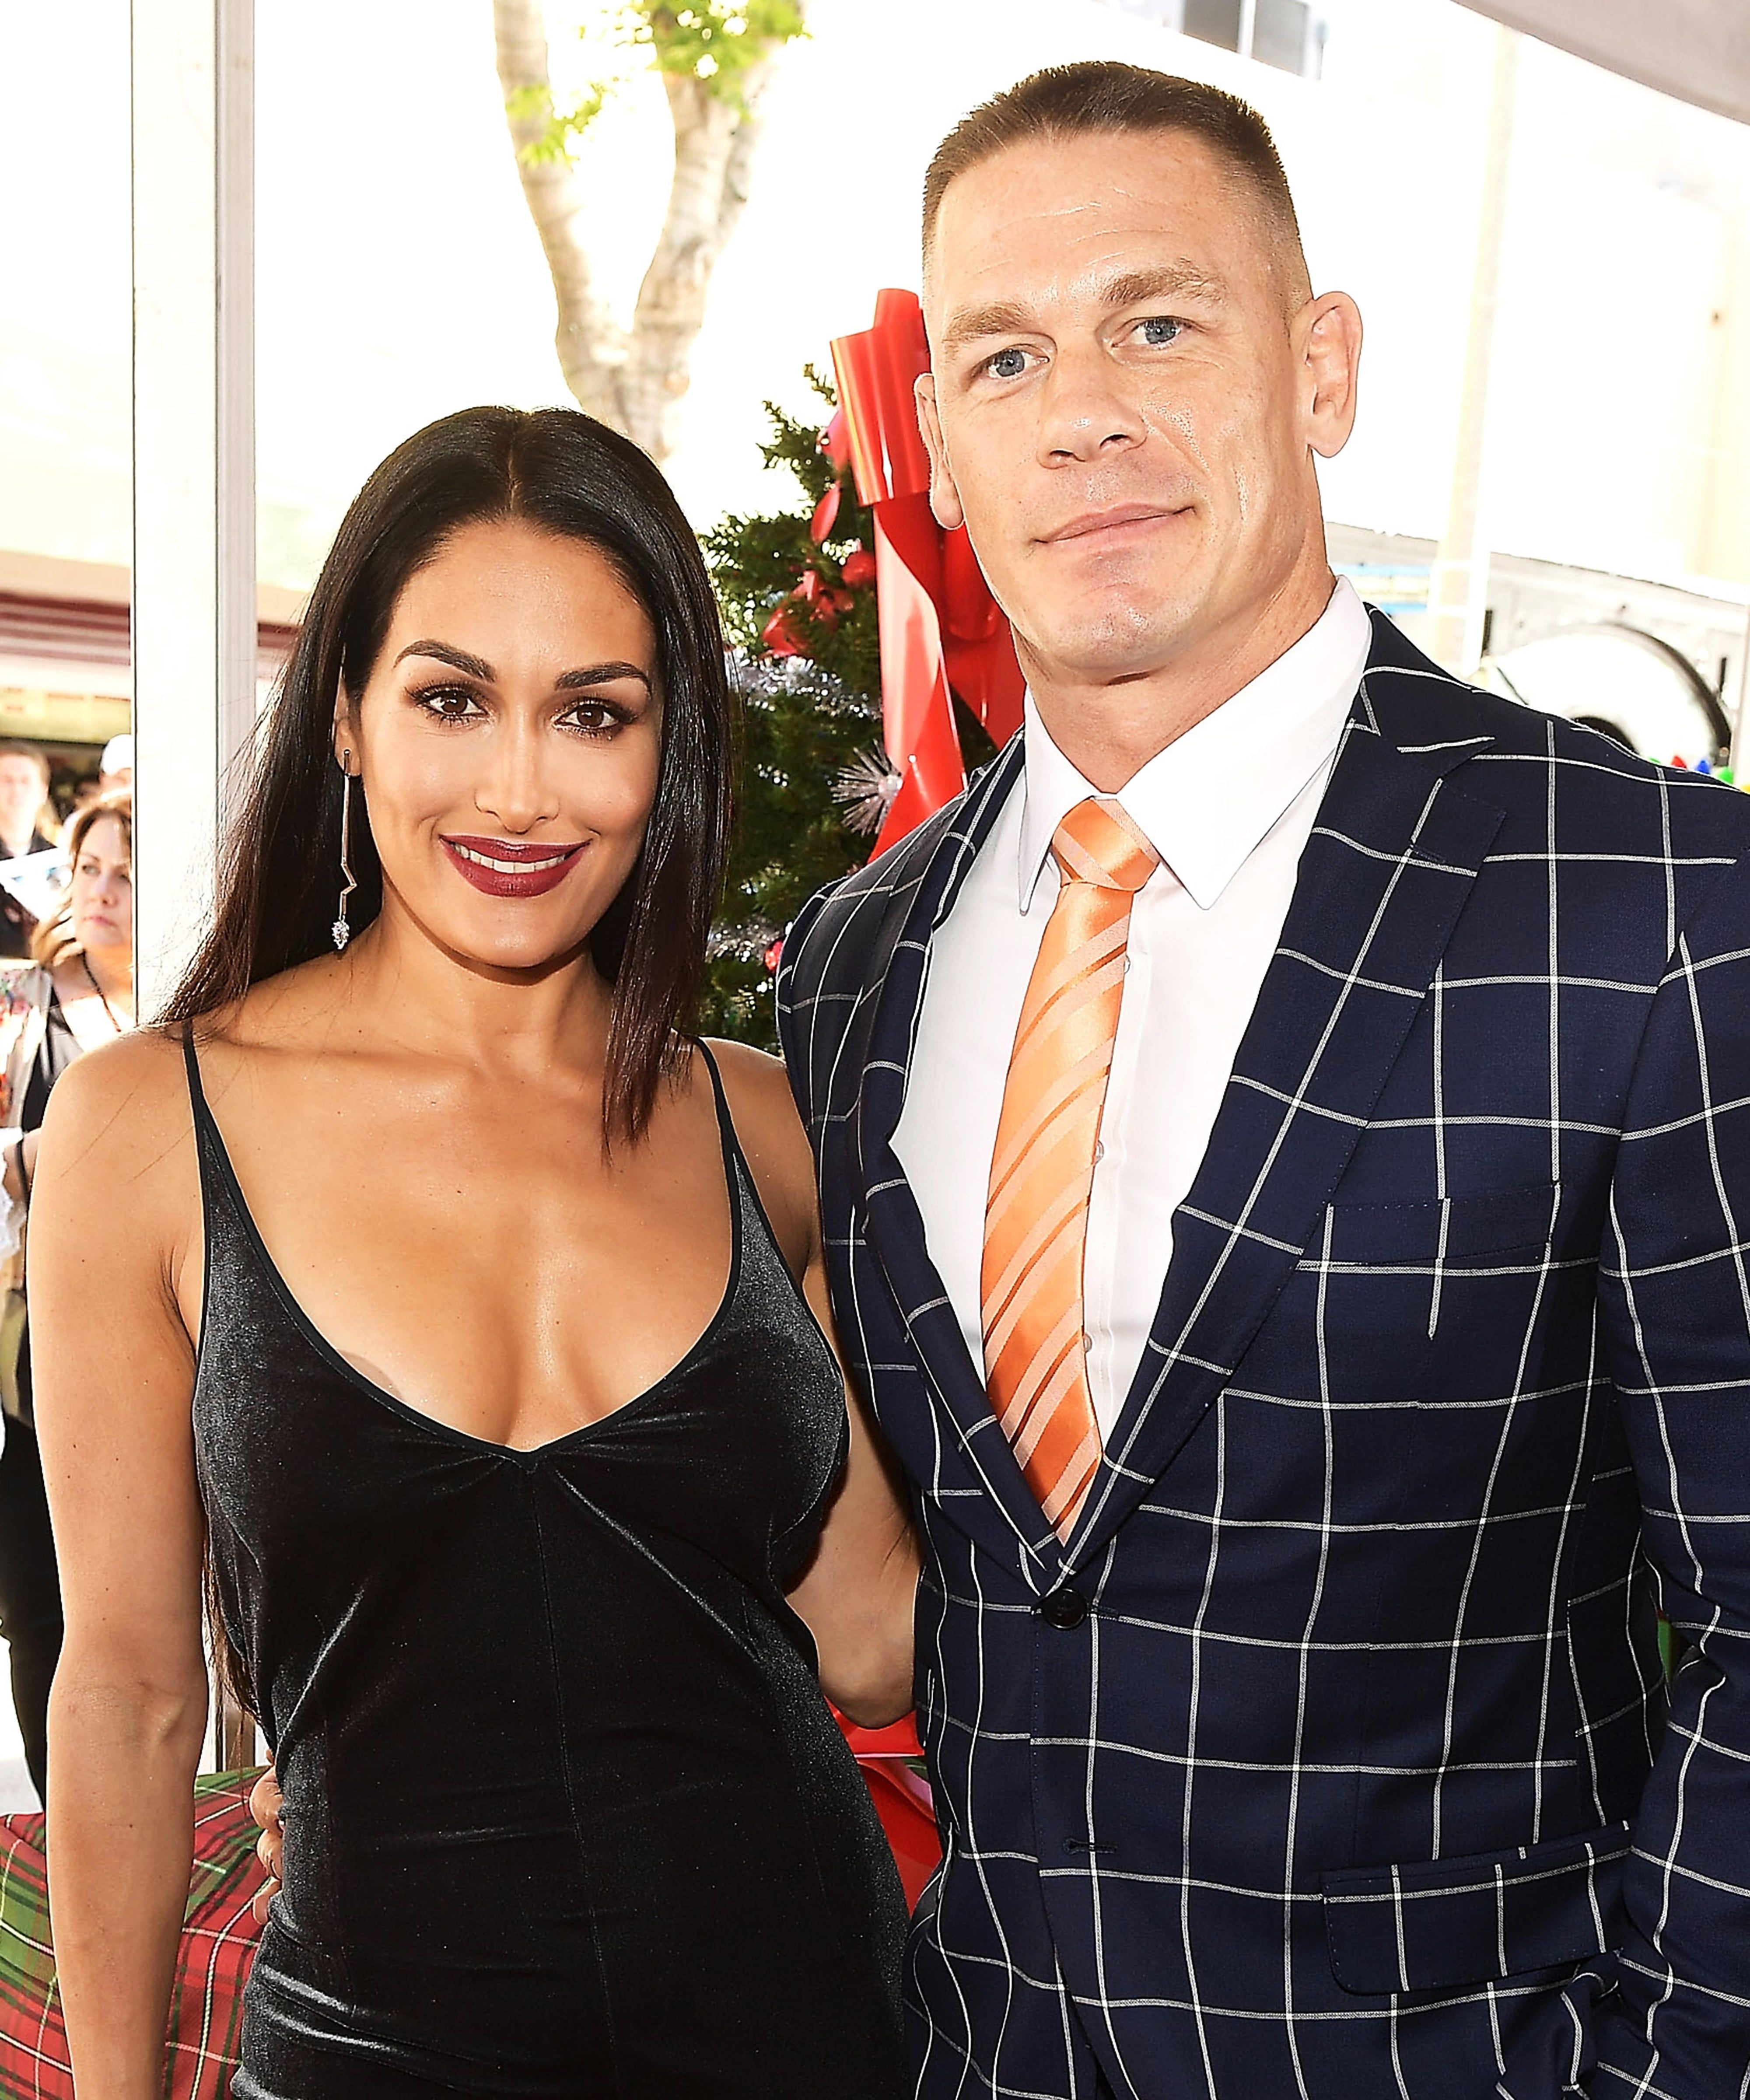 John Cena Has Blunt Response To Nikki Bella Breakup